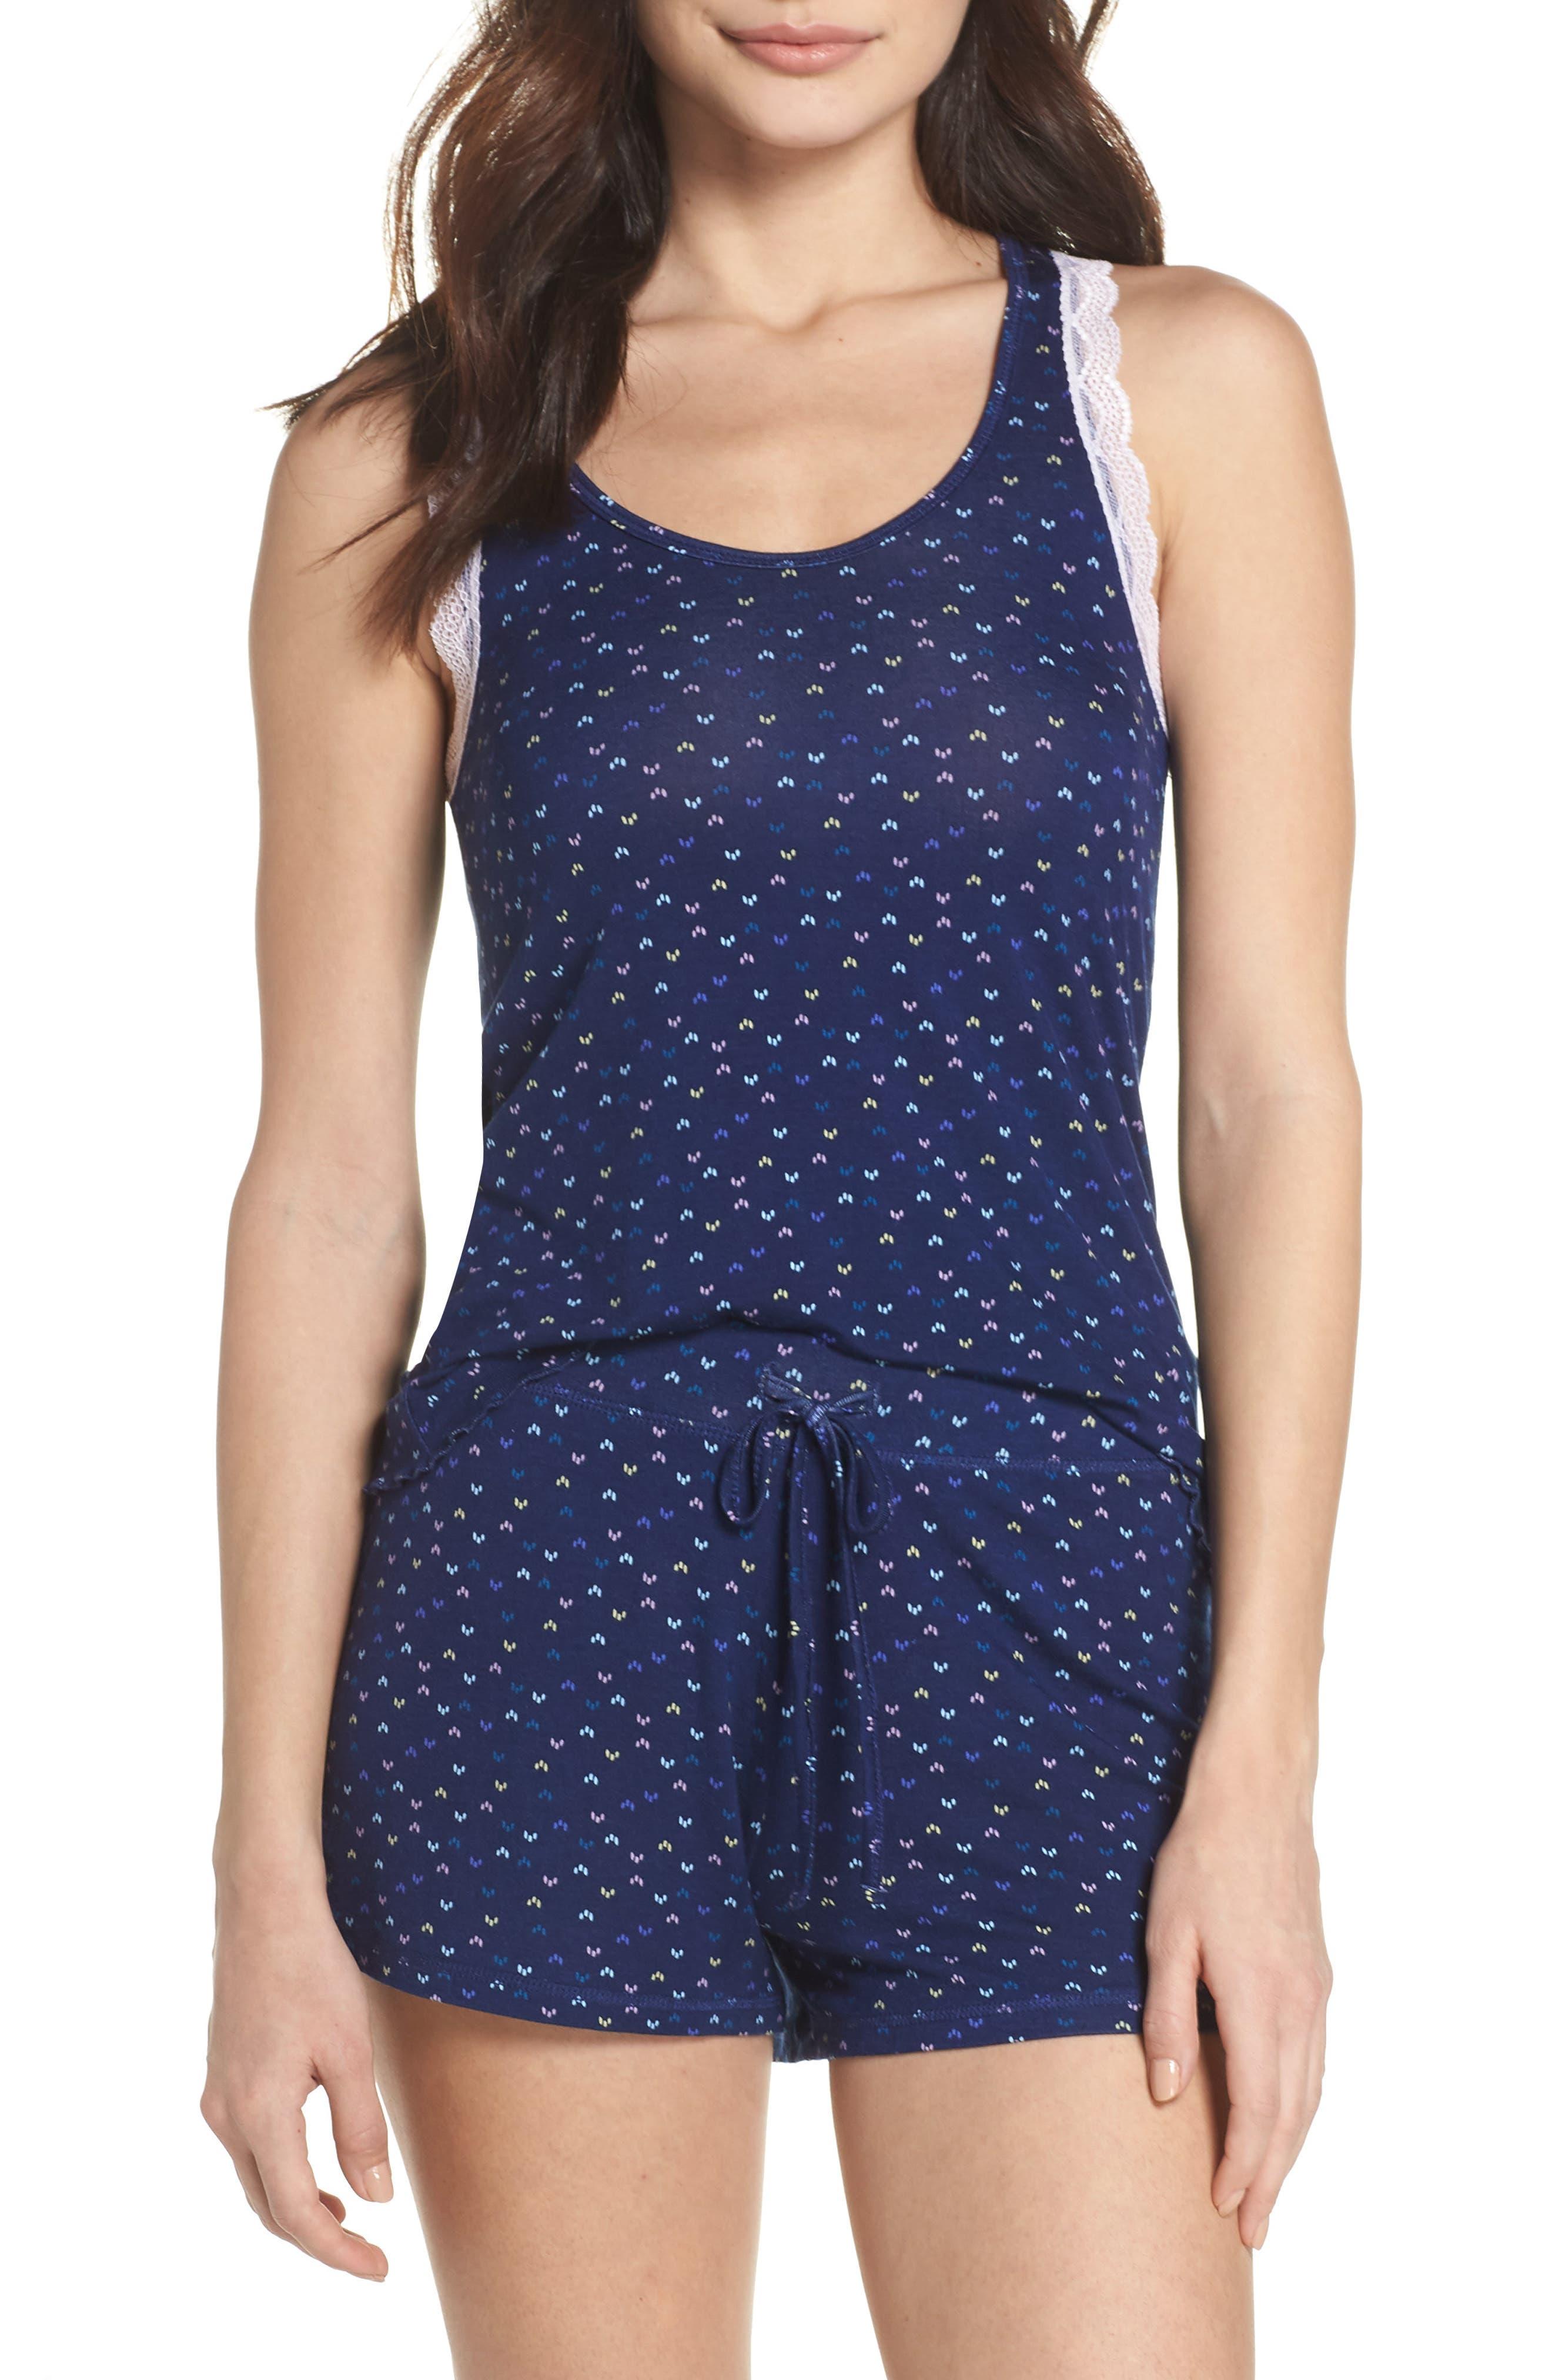 All American Lace Trim Short Pajamas,                             Main thumbnail 1, color,                             Midnight Moon